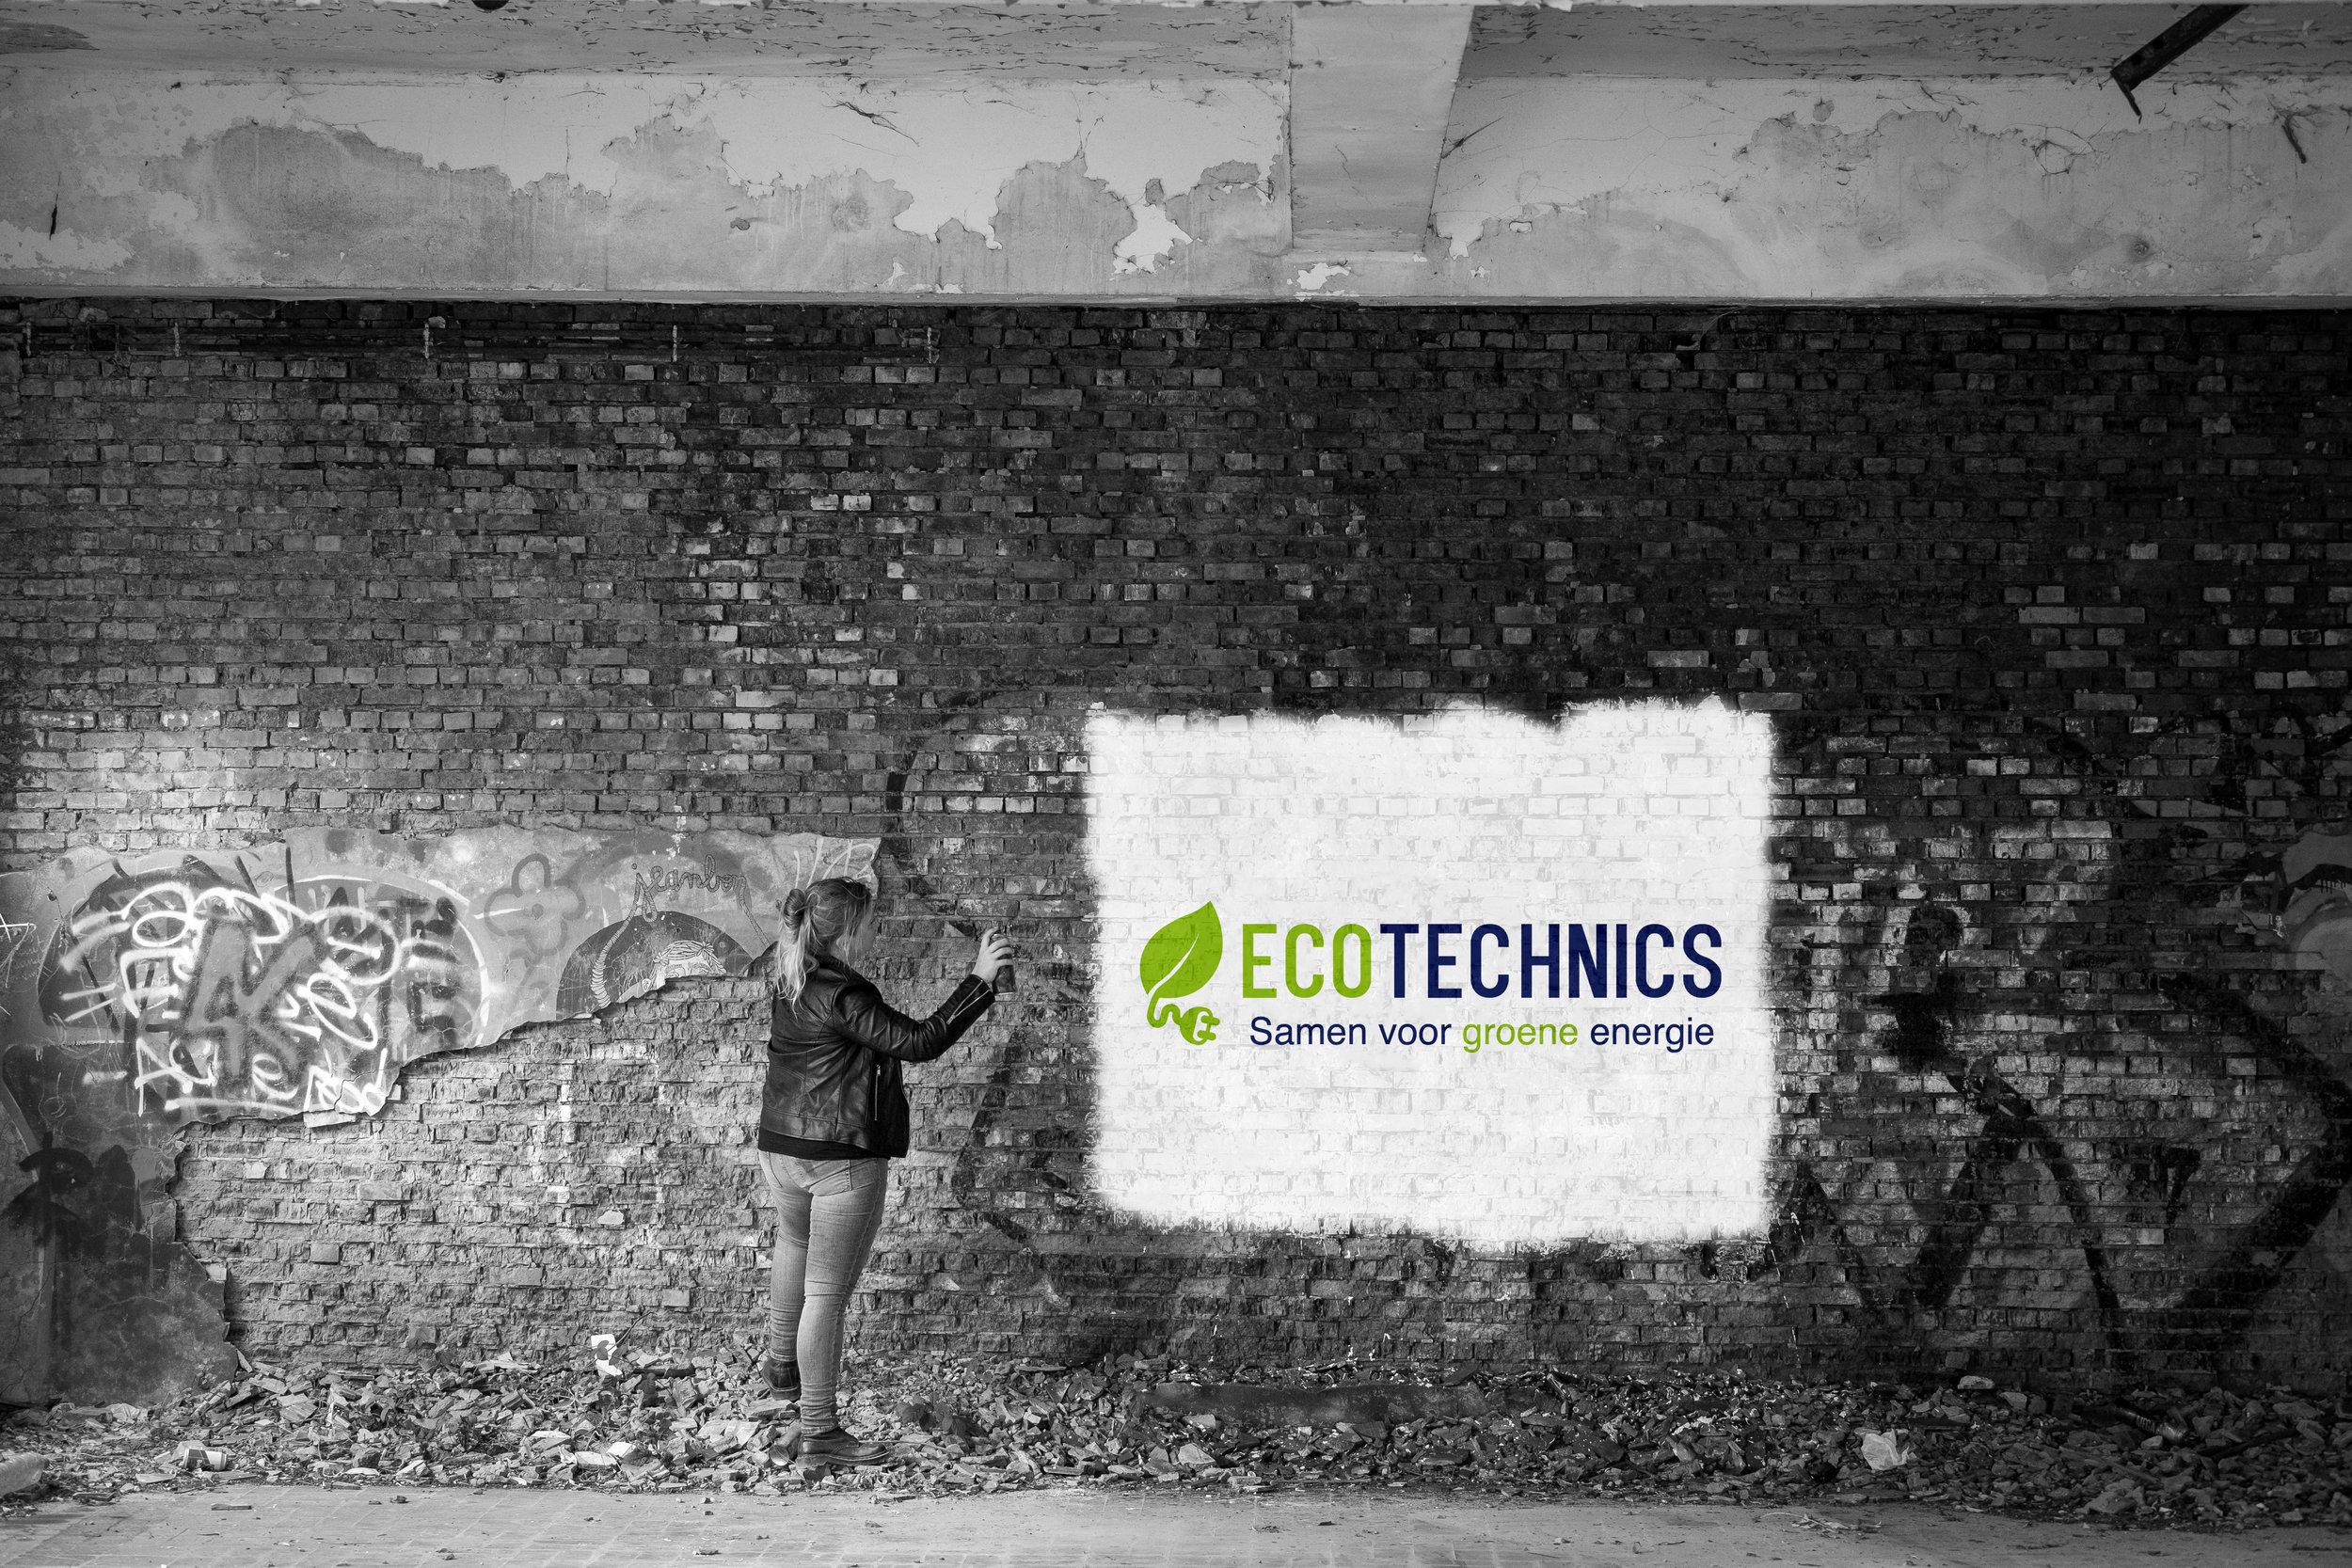 ecotechnics.jpg